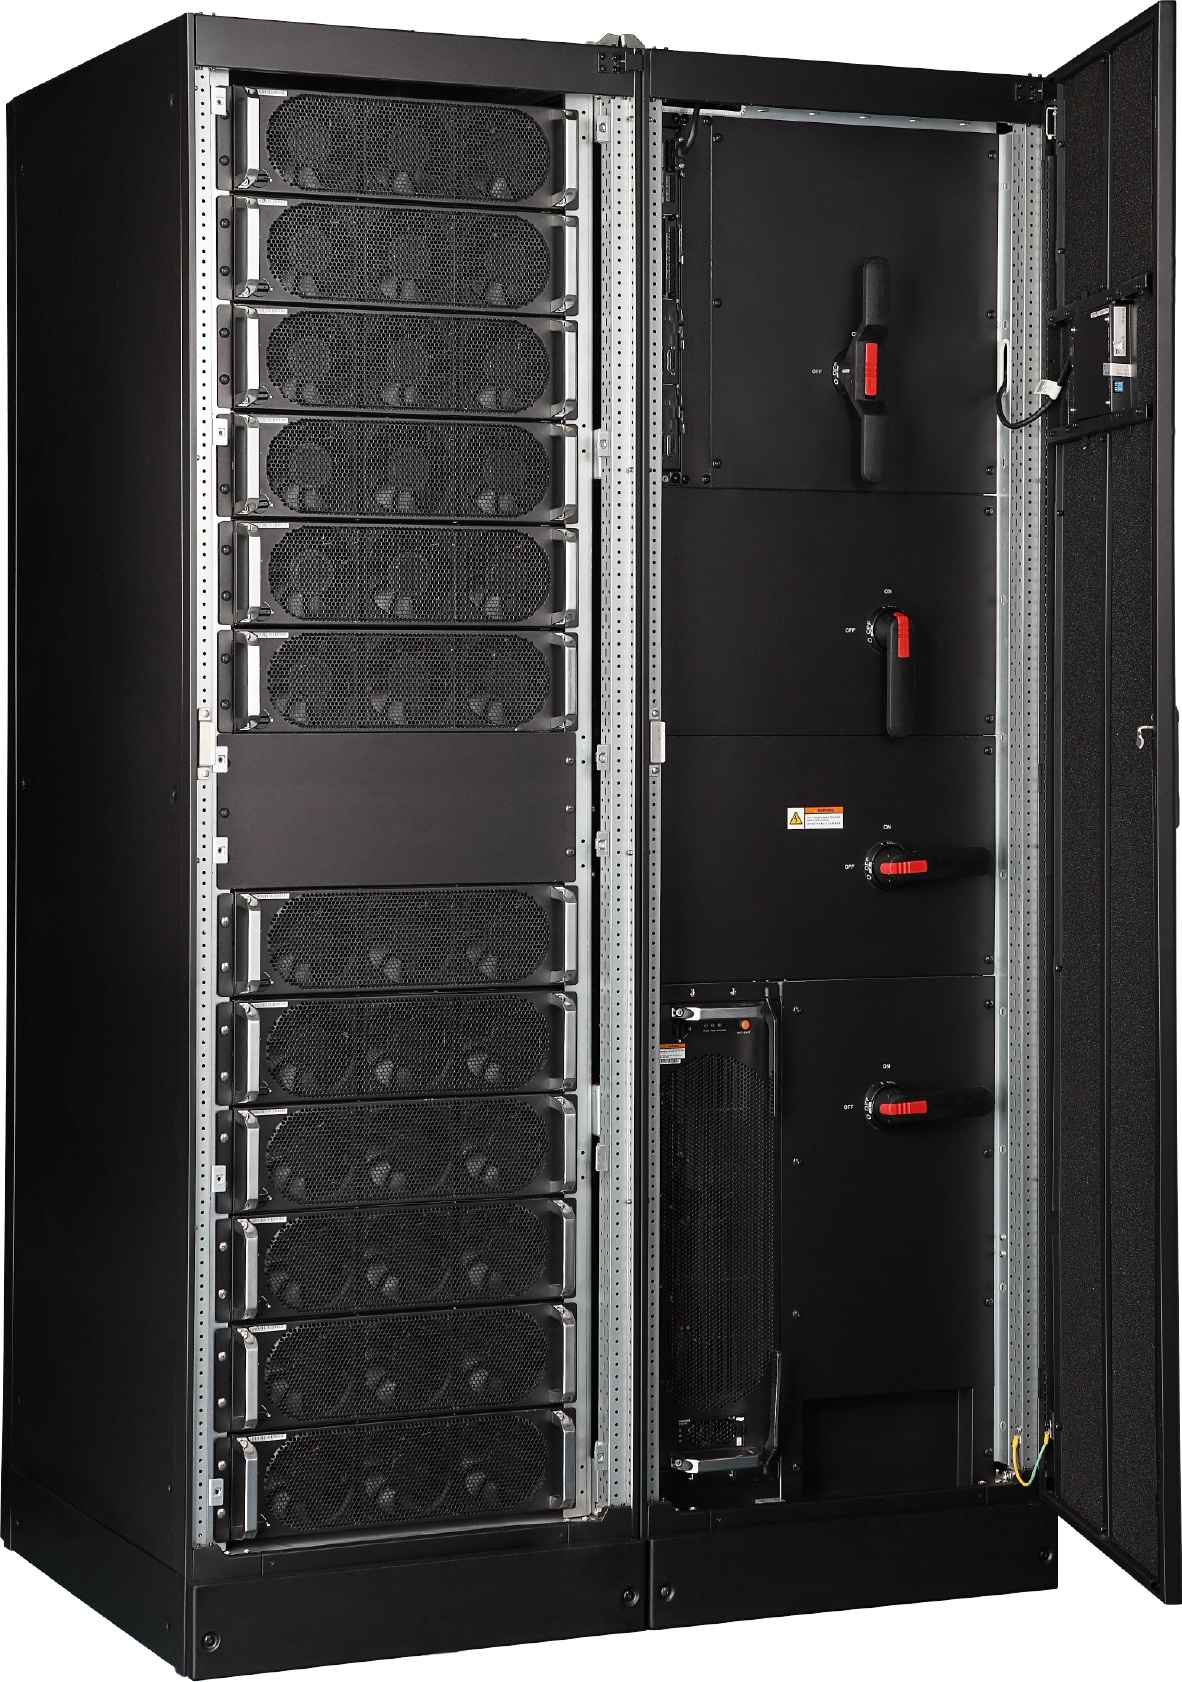 华为UPS5000-E系列 (25-800kVA)